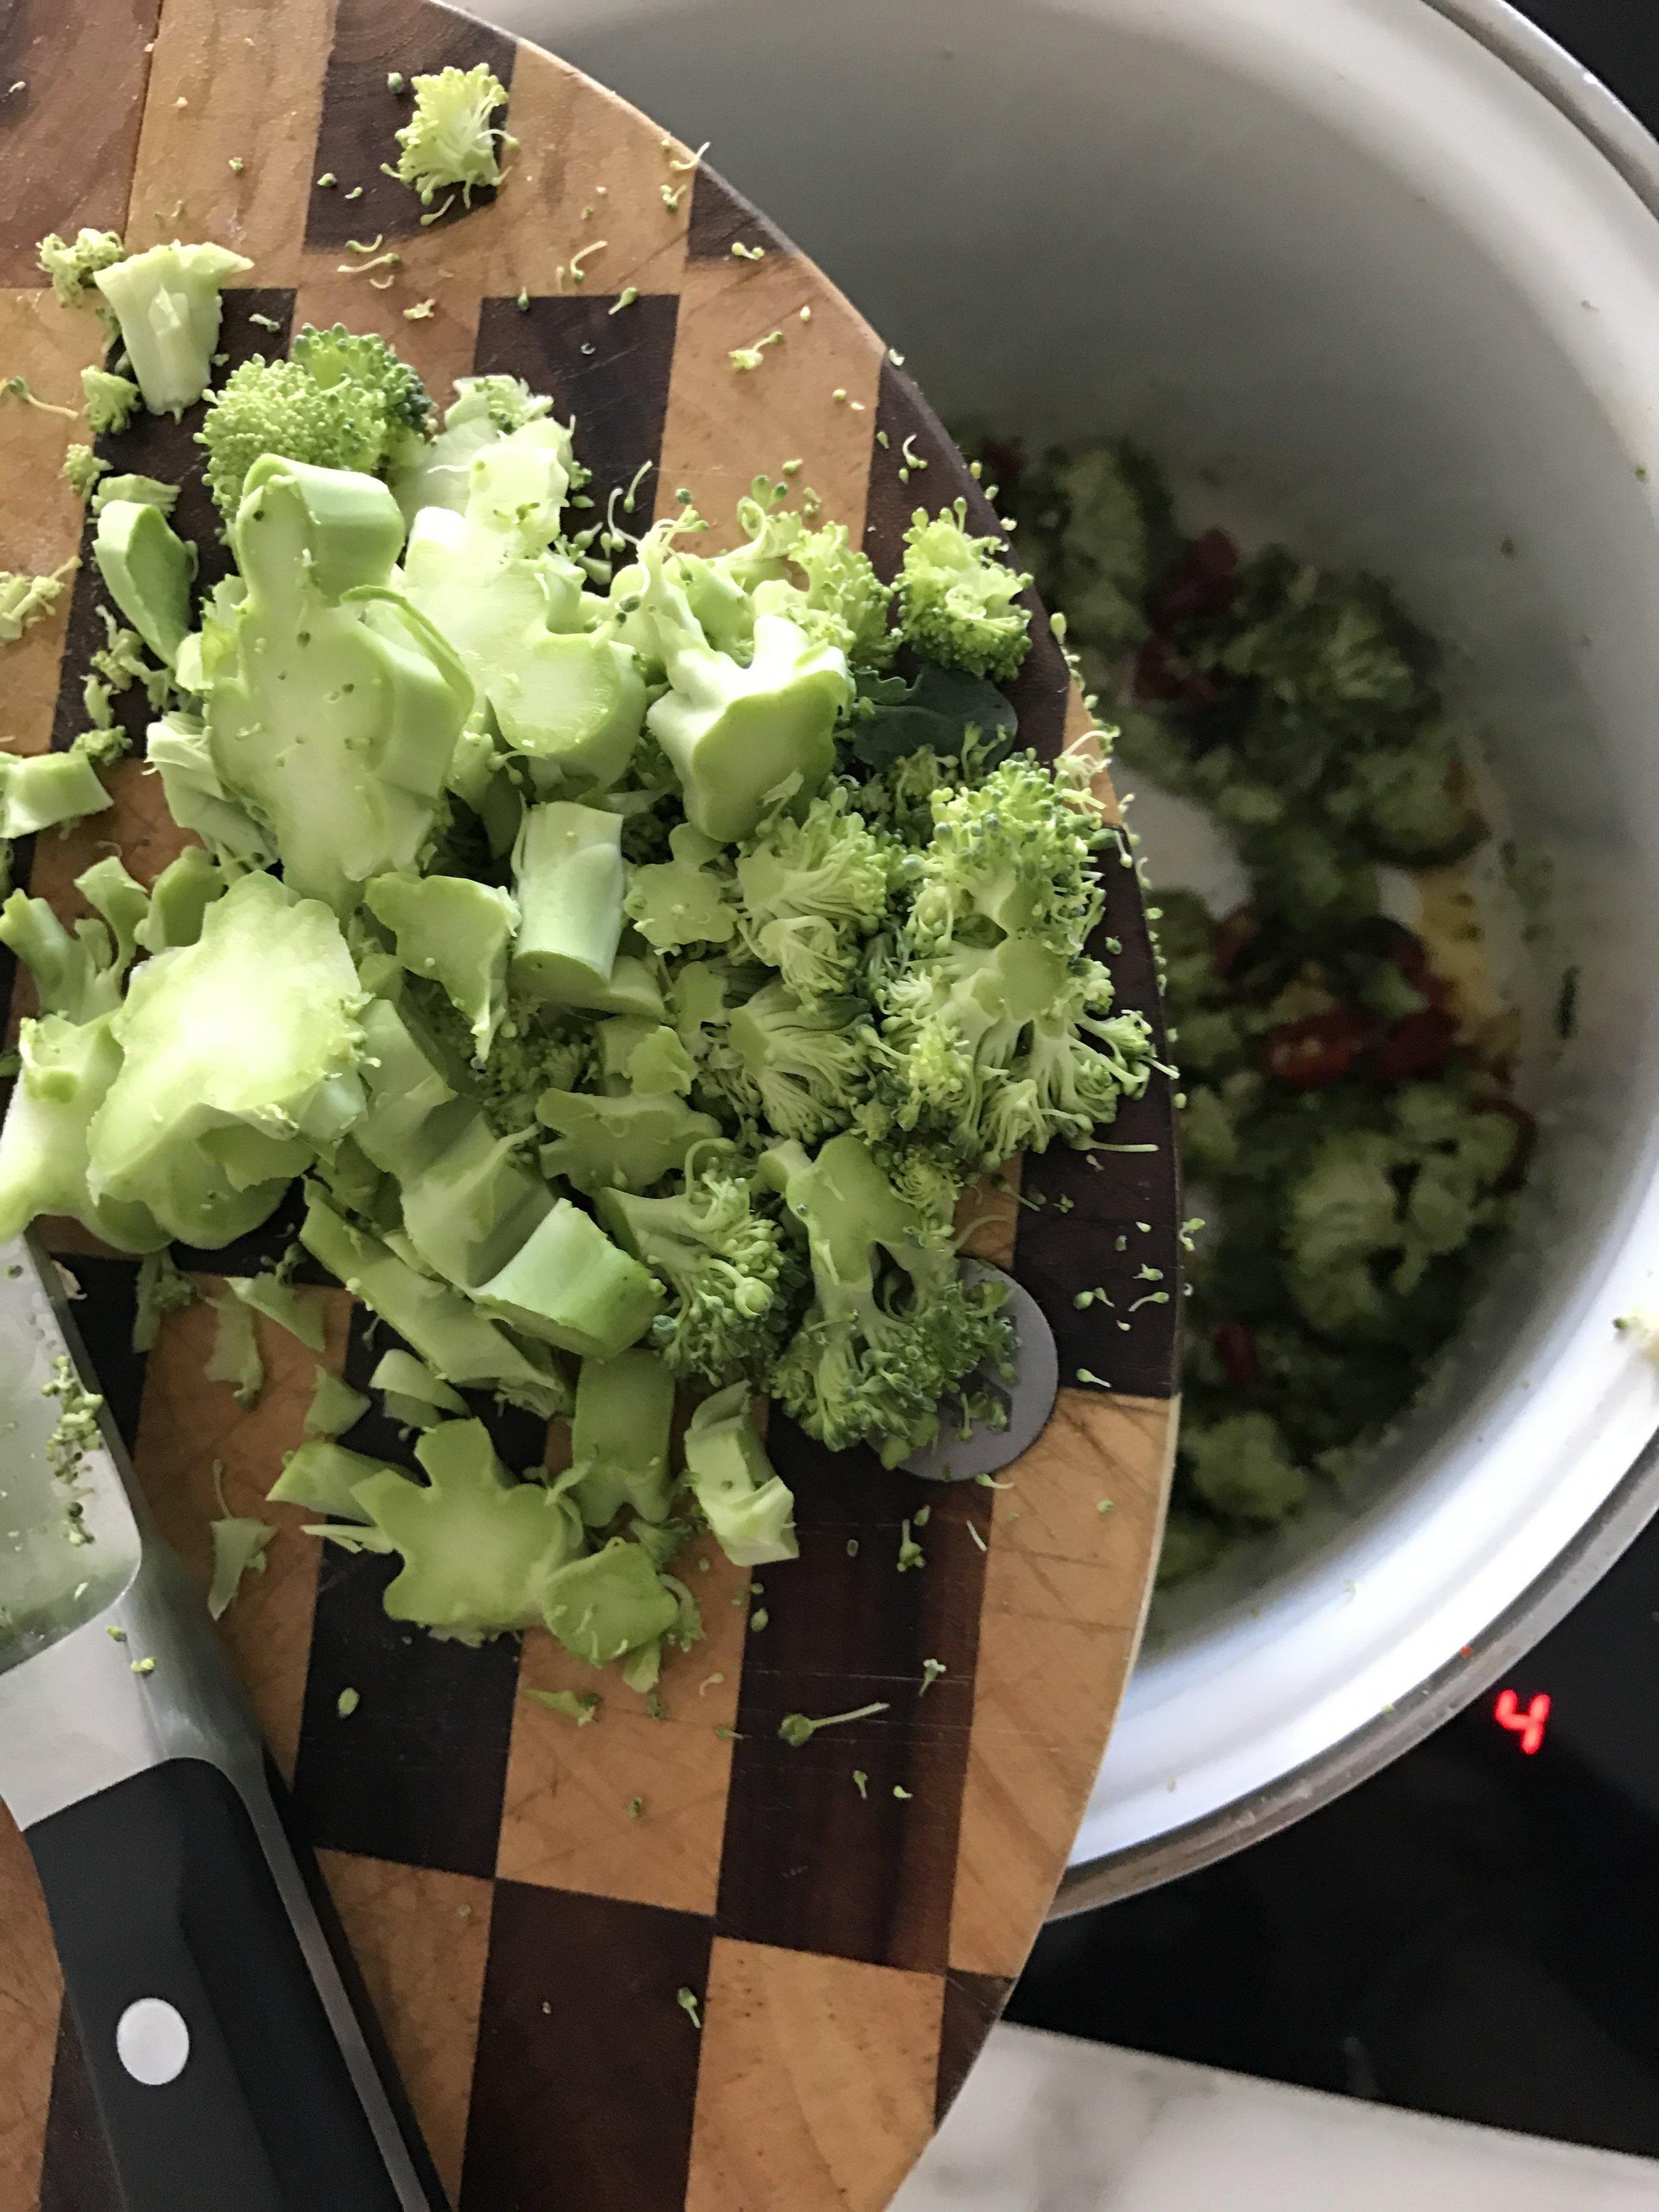 Chop up the broccoli